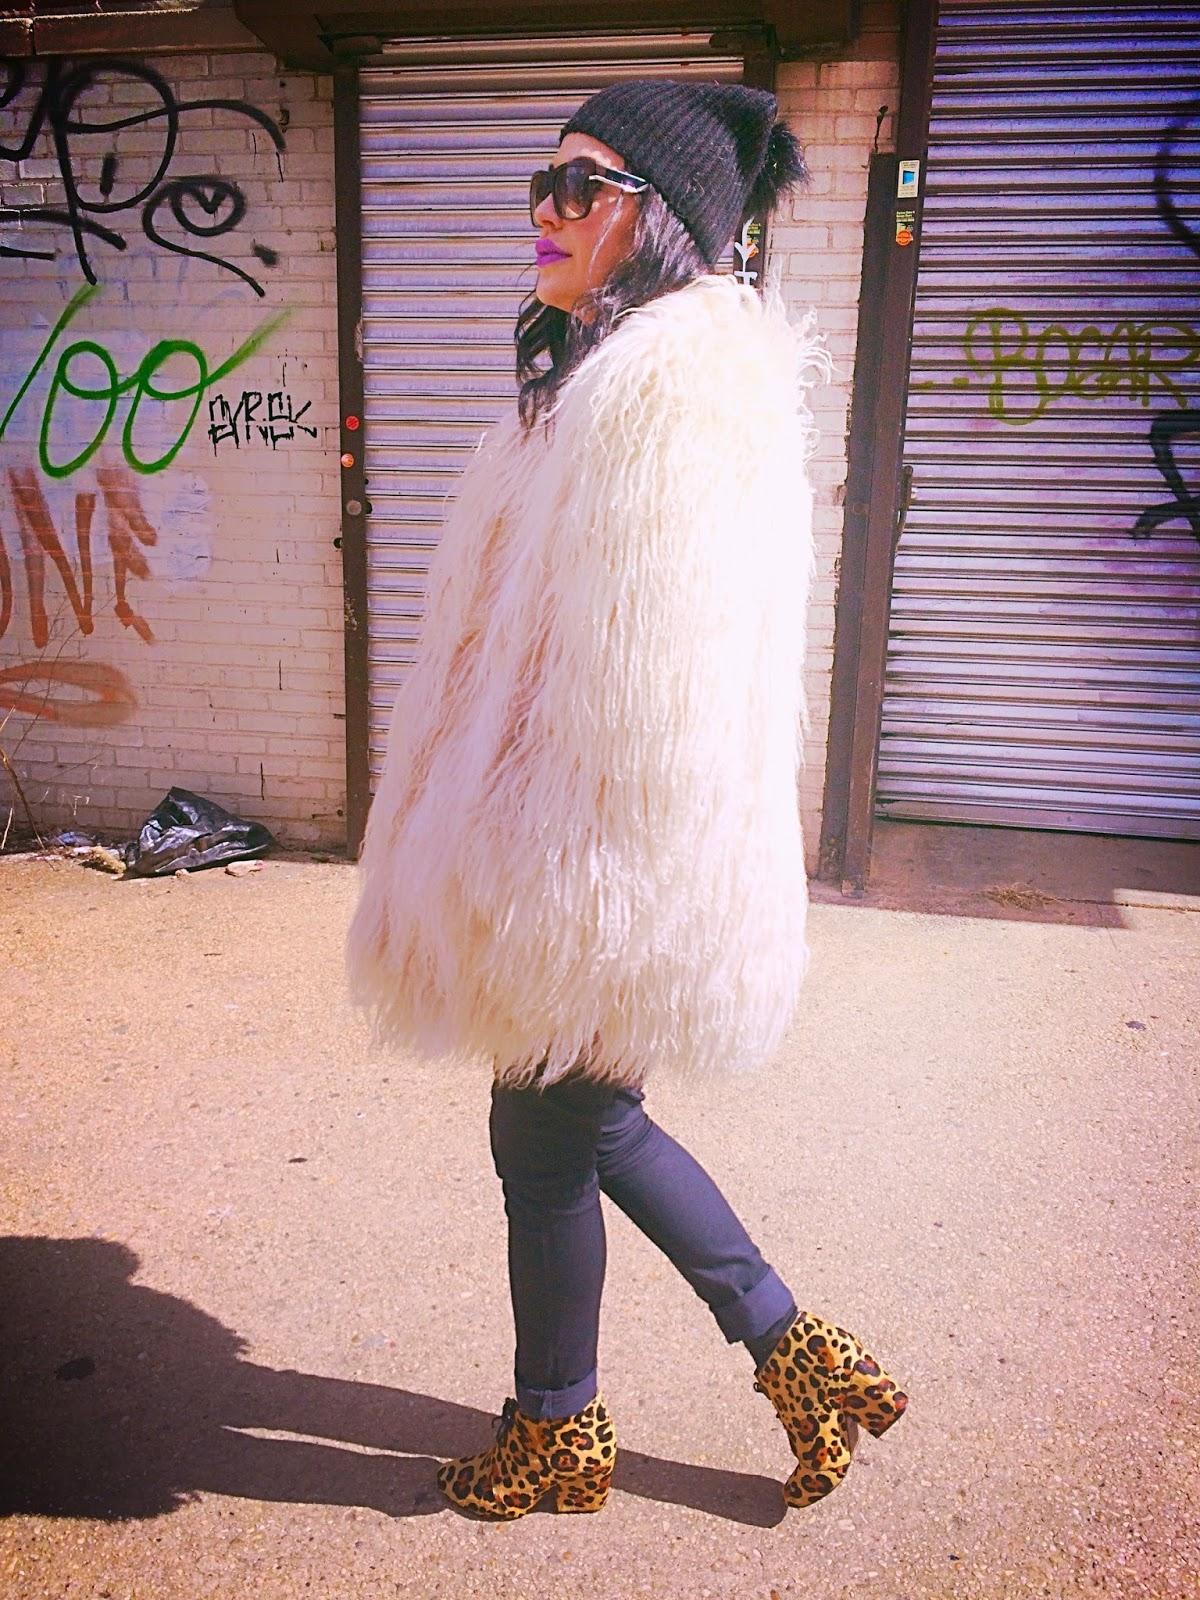 Brooklyn rocker girl outfit, Brooklyn wall graffiti, Brooklyn hip street art, NYC streetstyle, street style blogger, Olivia Inkster street writer, New York City rocker girl style